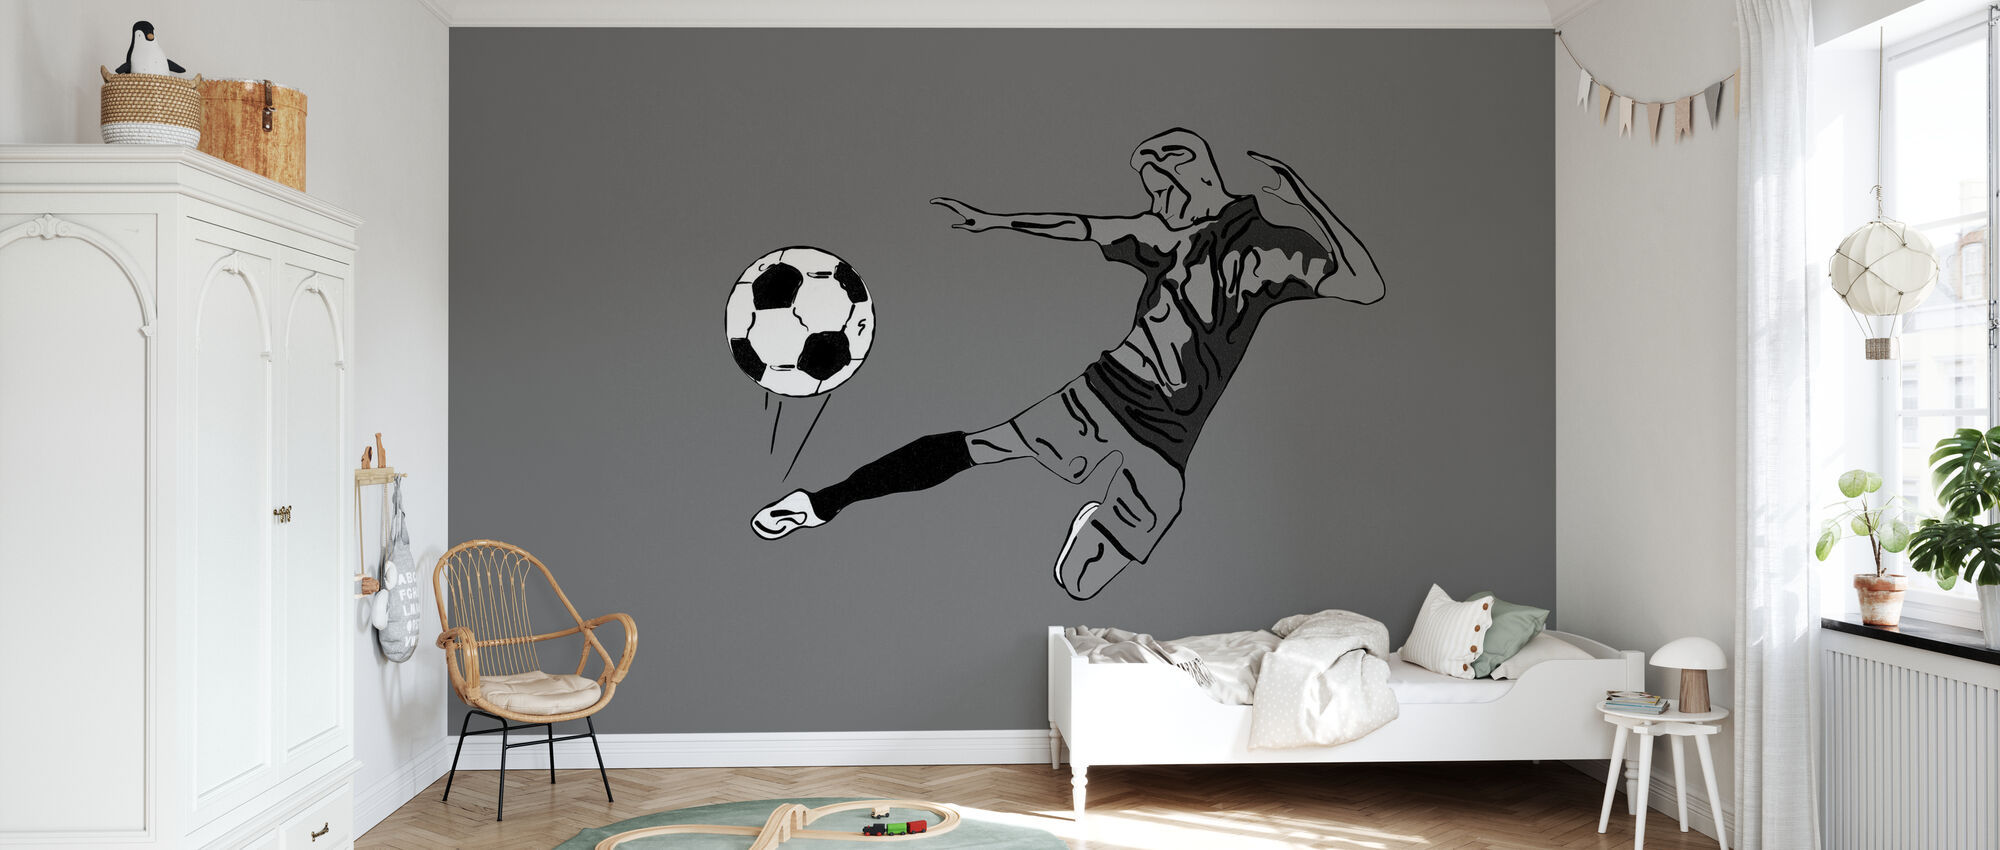 Kick It - Grey - Wallpaper - Kids Room